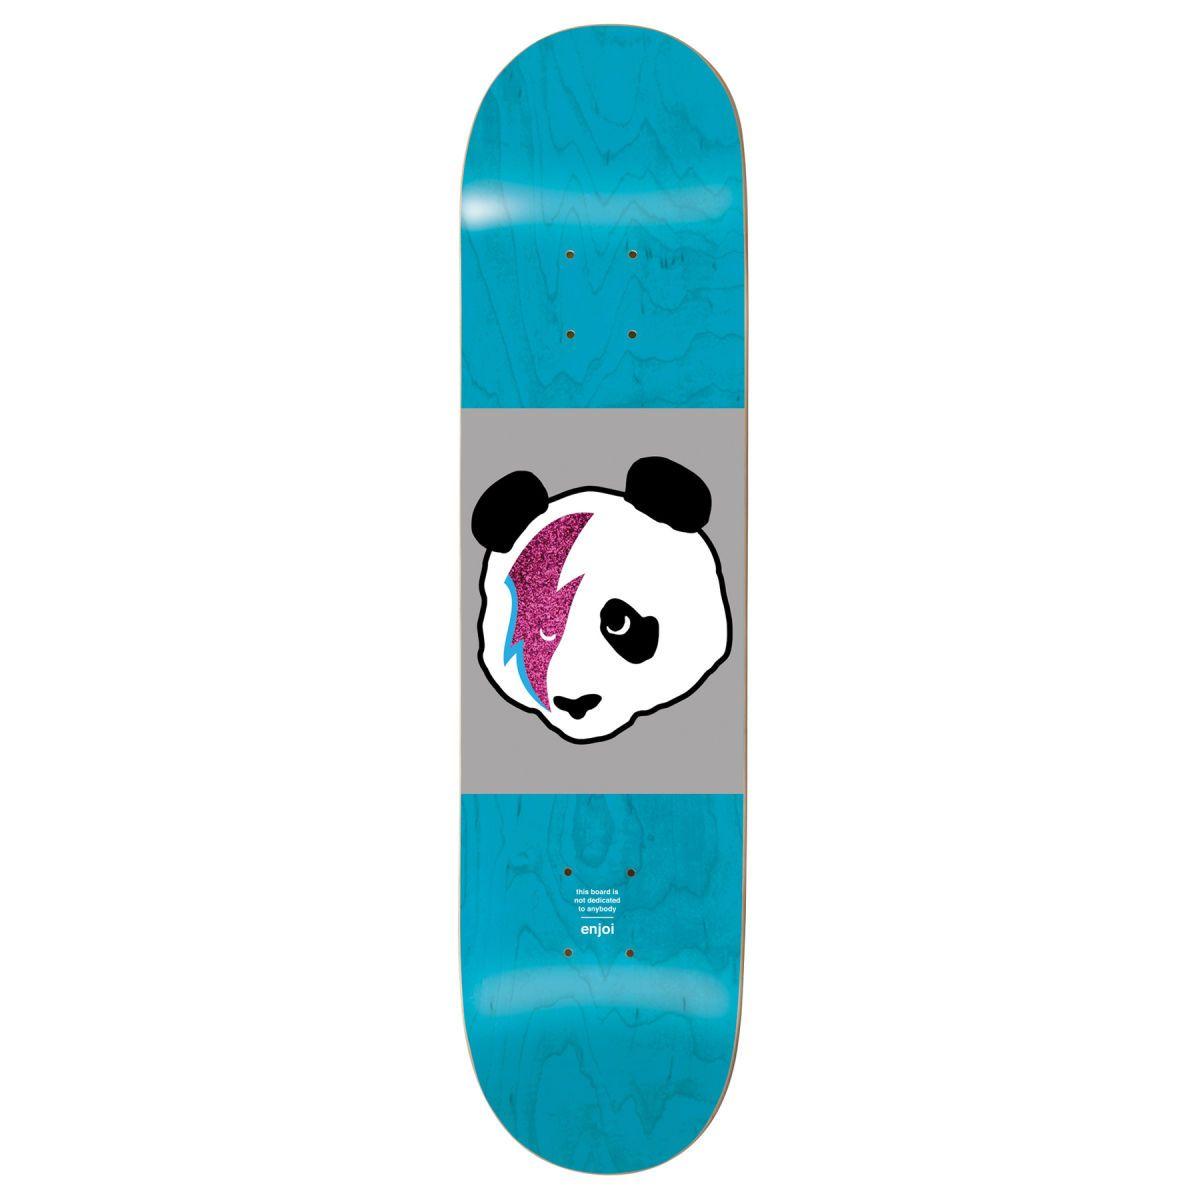 2fc3f09c5c2 Enjoi Stardust Panda Skateboard Deck - 8 inch | Free Delivery* | Kai